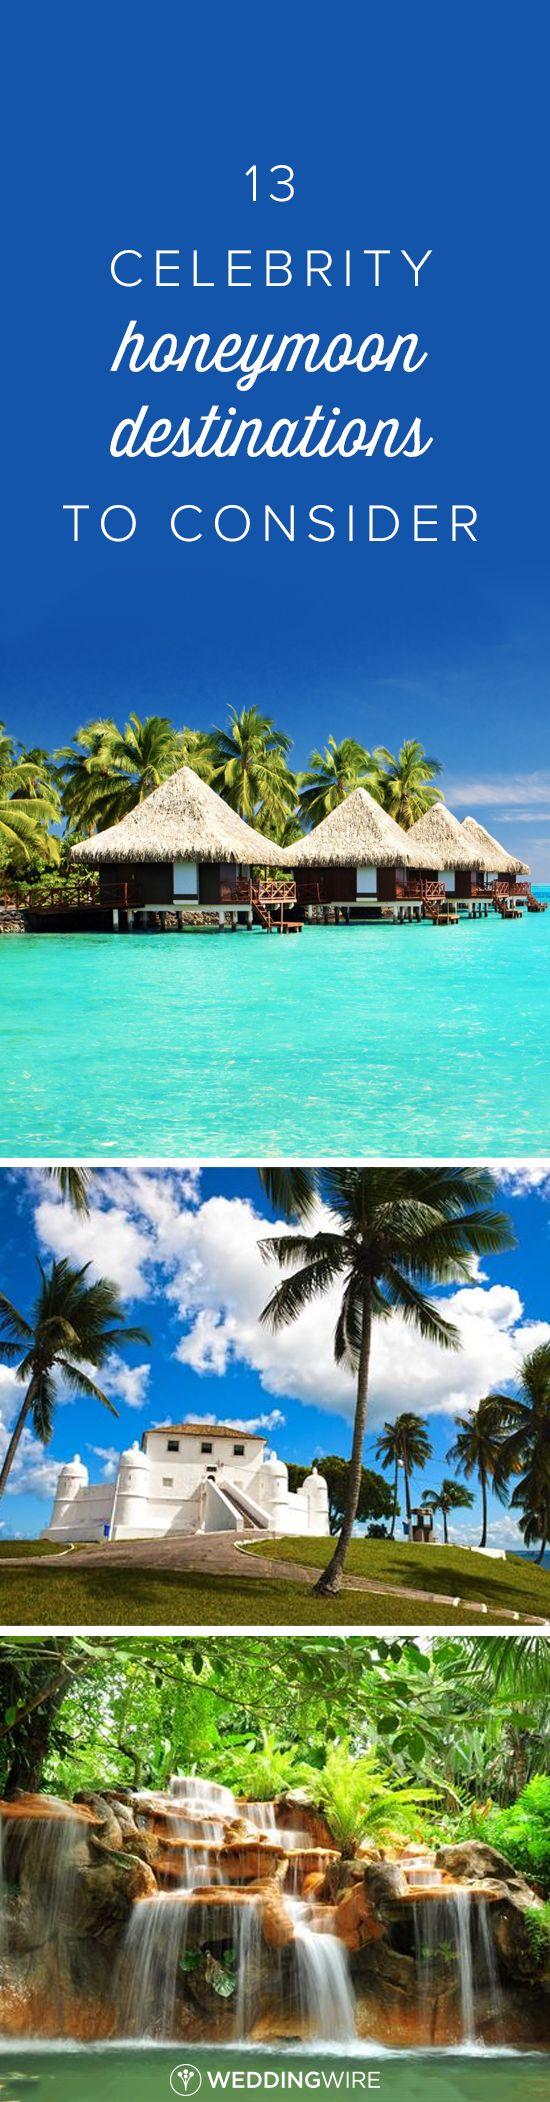 15 best honeymooners images on pinterest dream vacations for Honeymoon spots in virginia